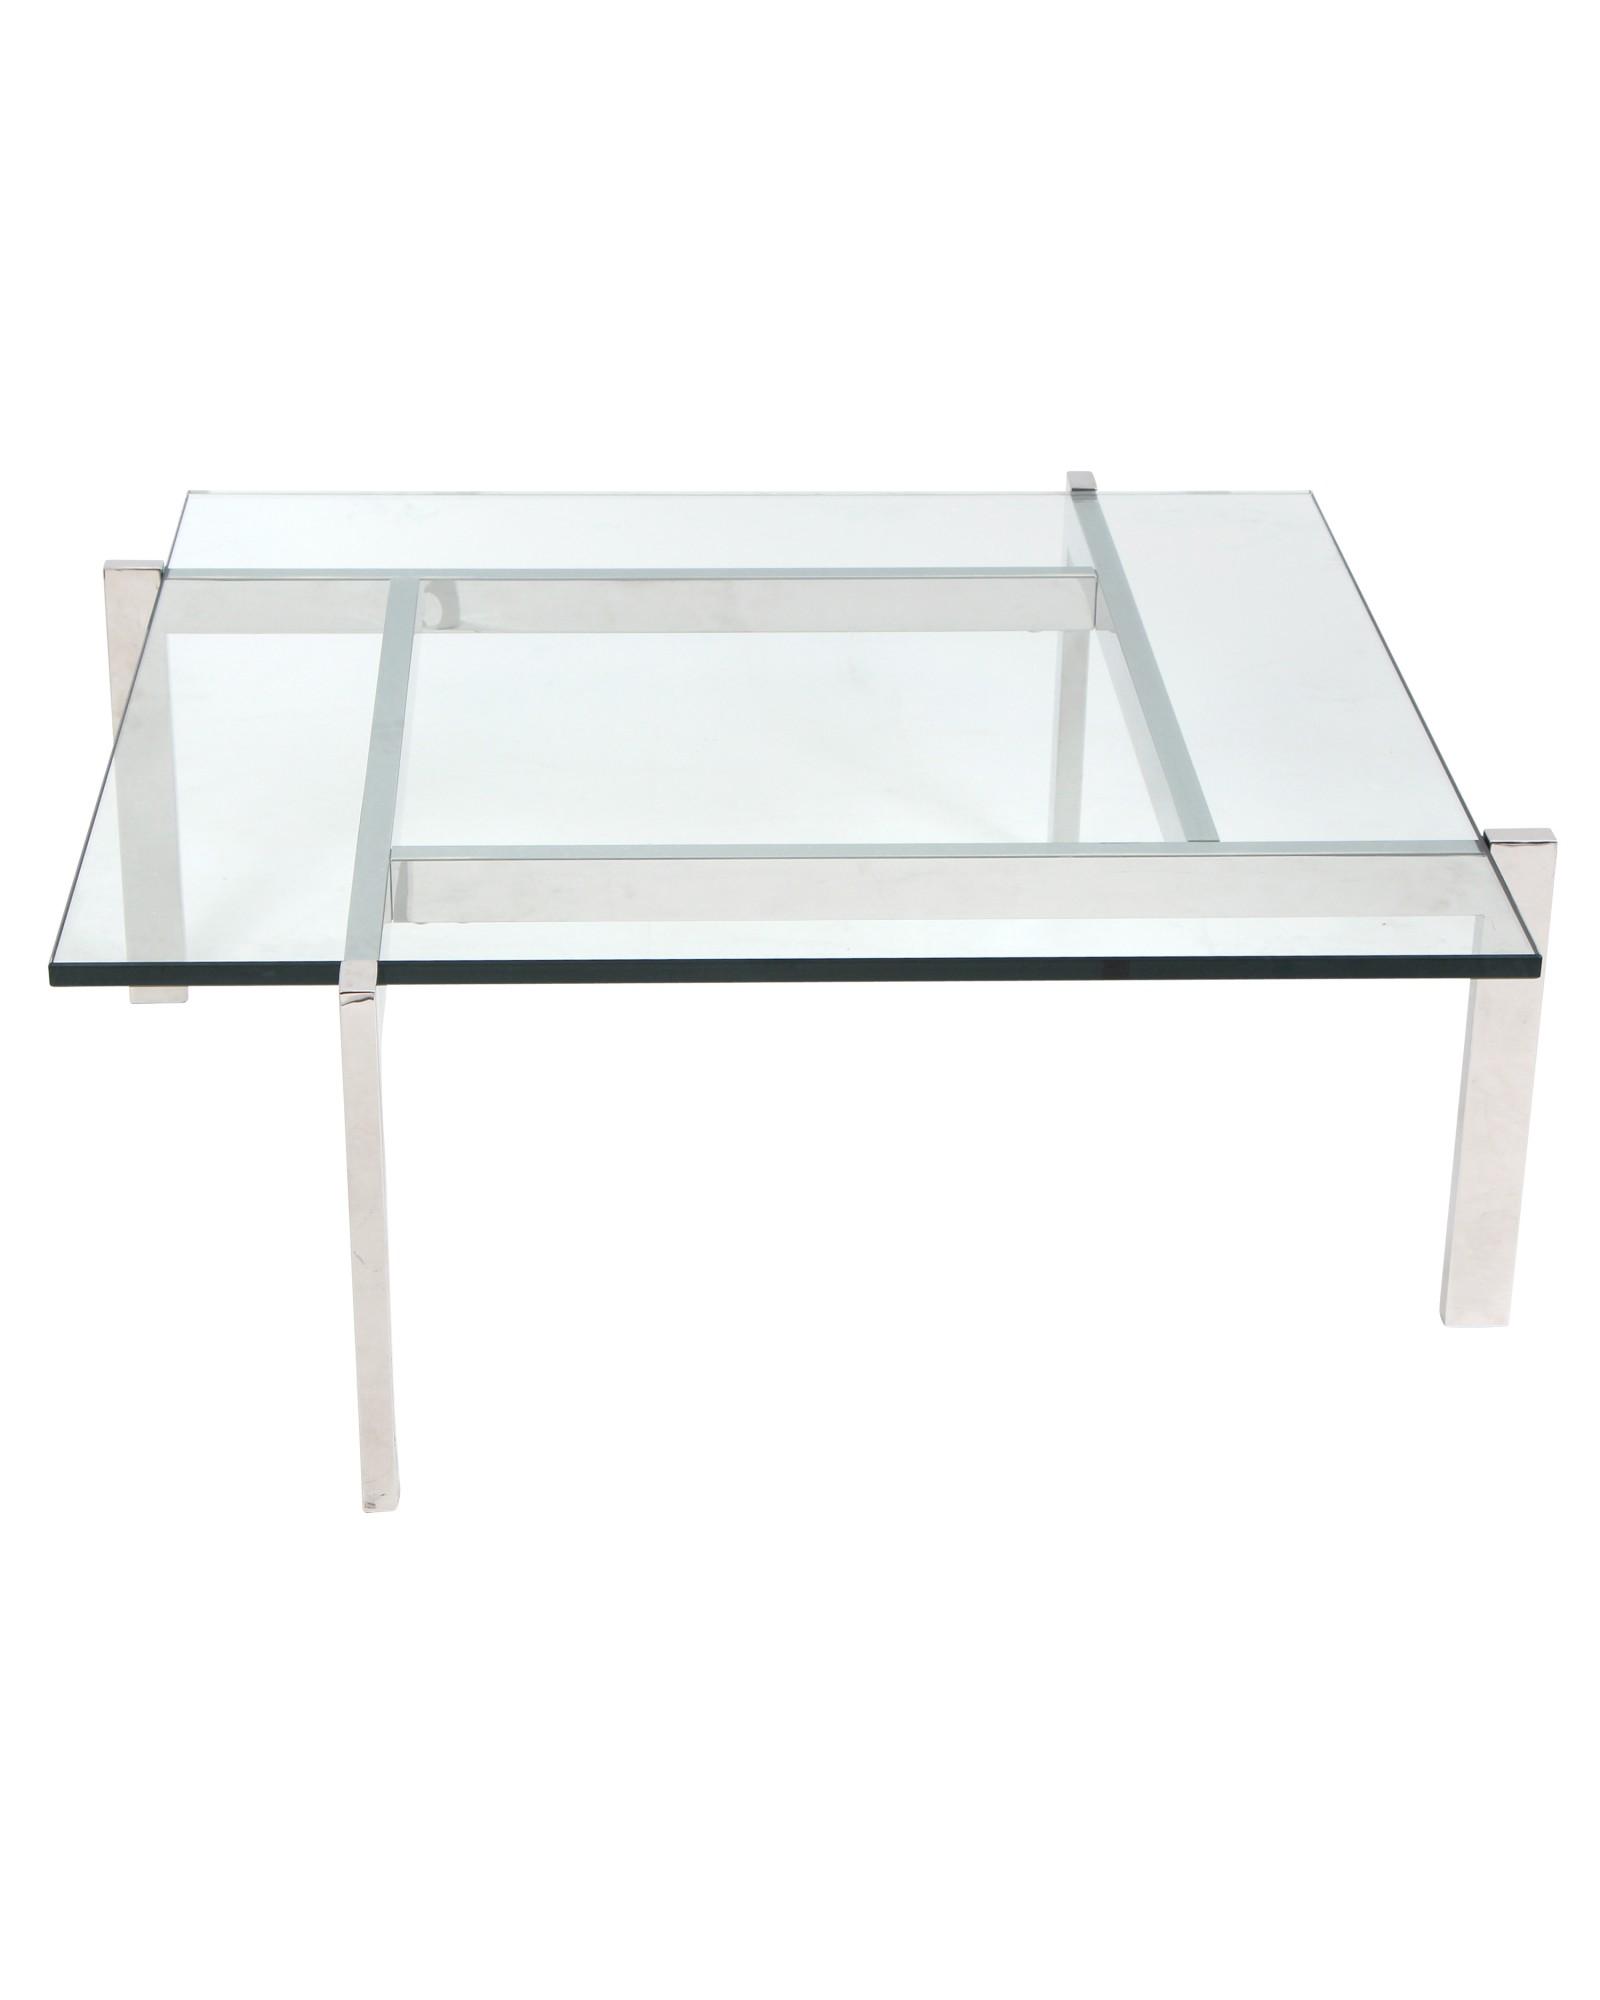 Cosmopolitan Coffee Contemporary Table in Clear